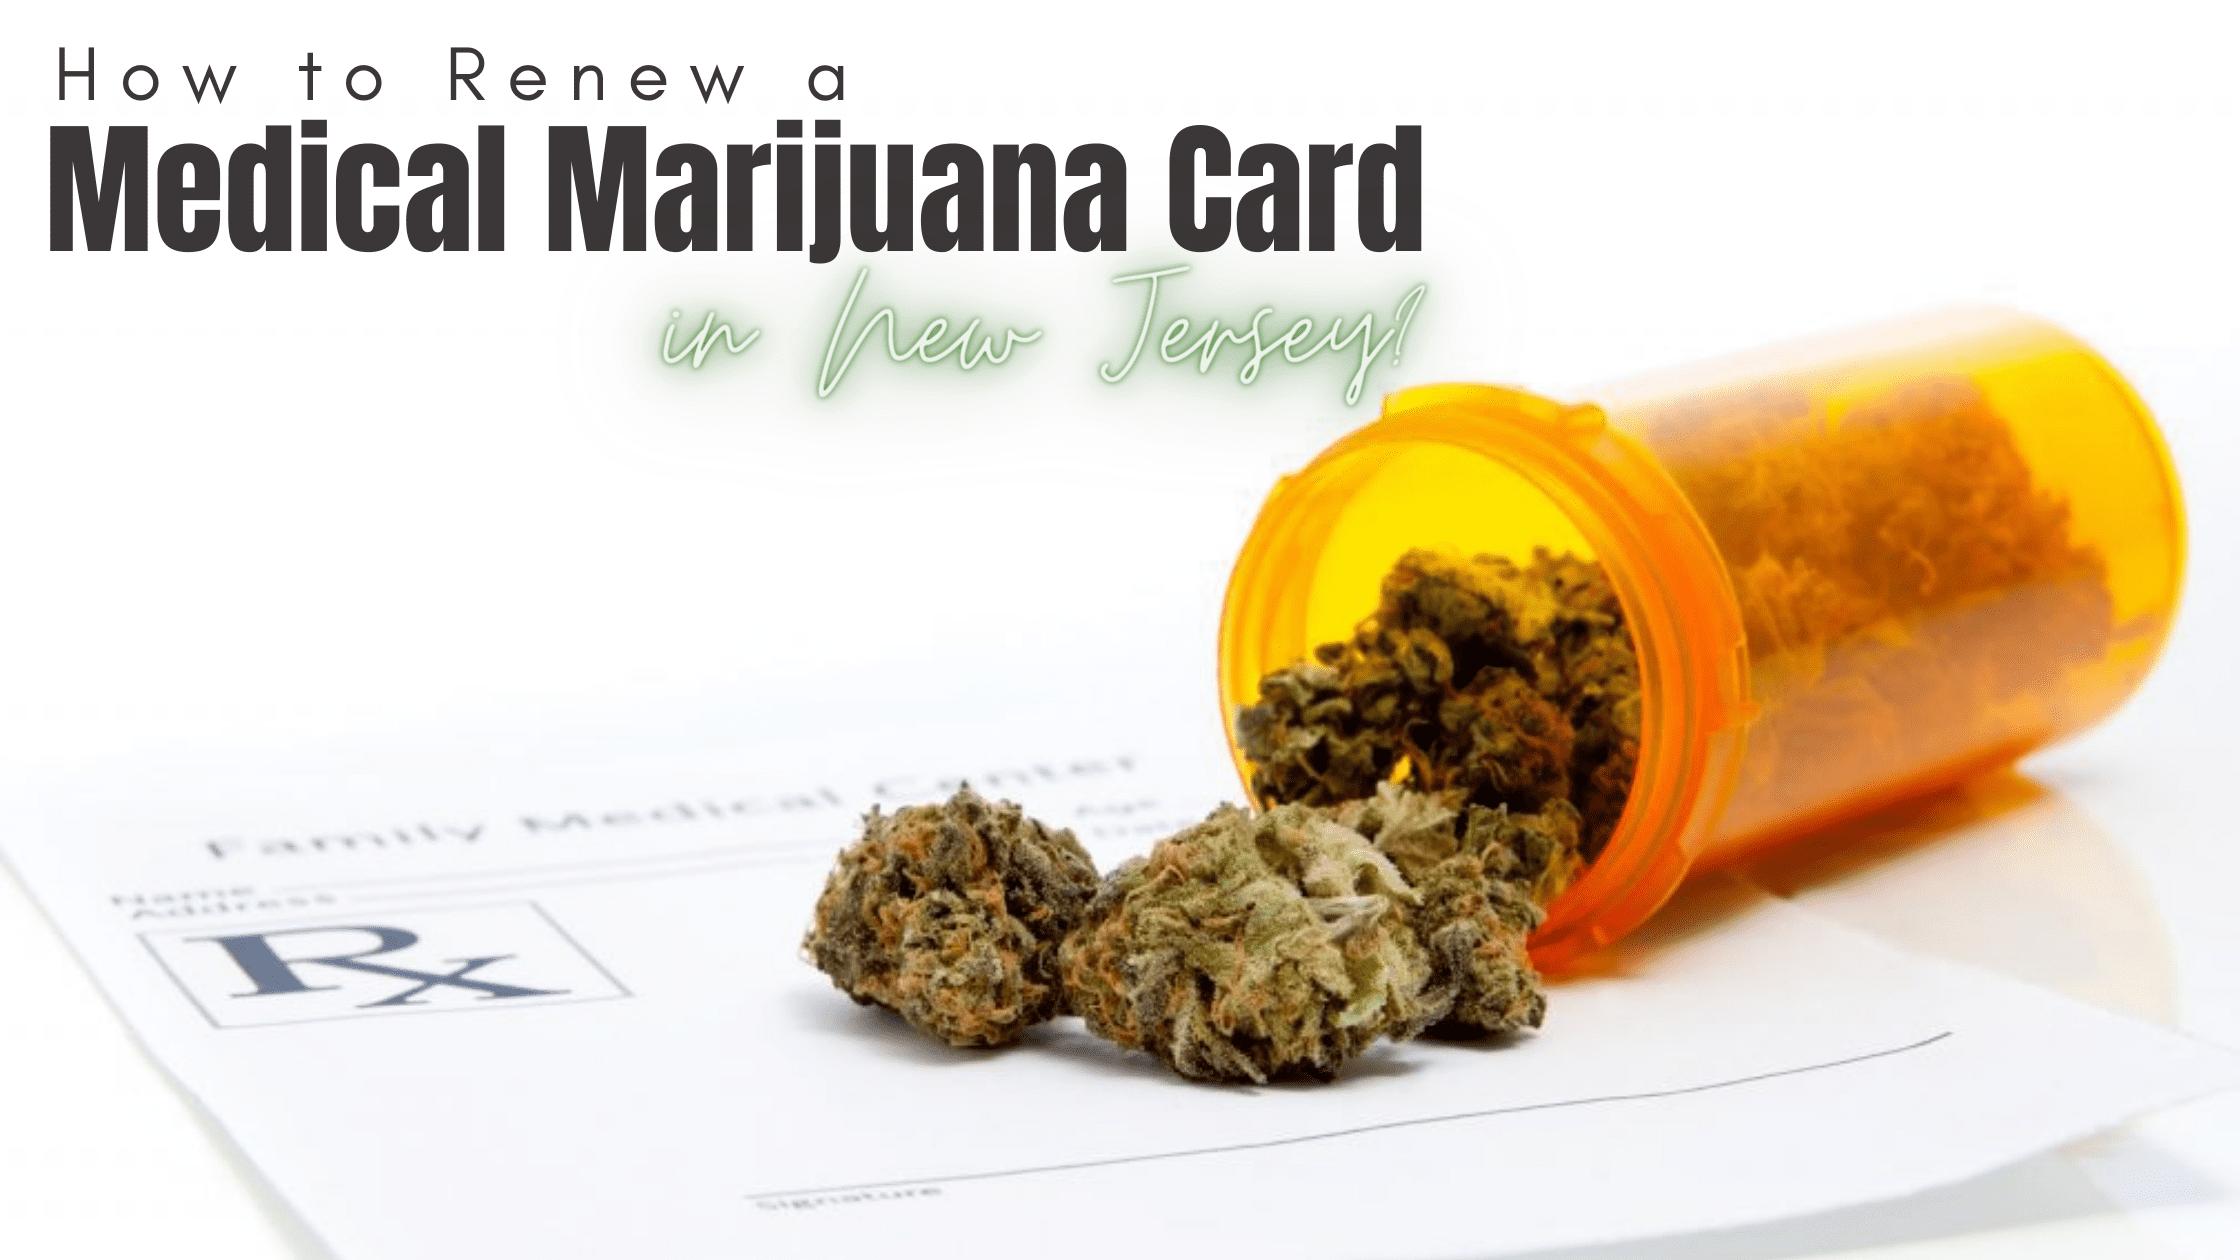 How to Renew Medical Marijuana Card in New Jersey